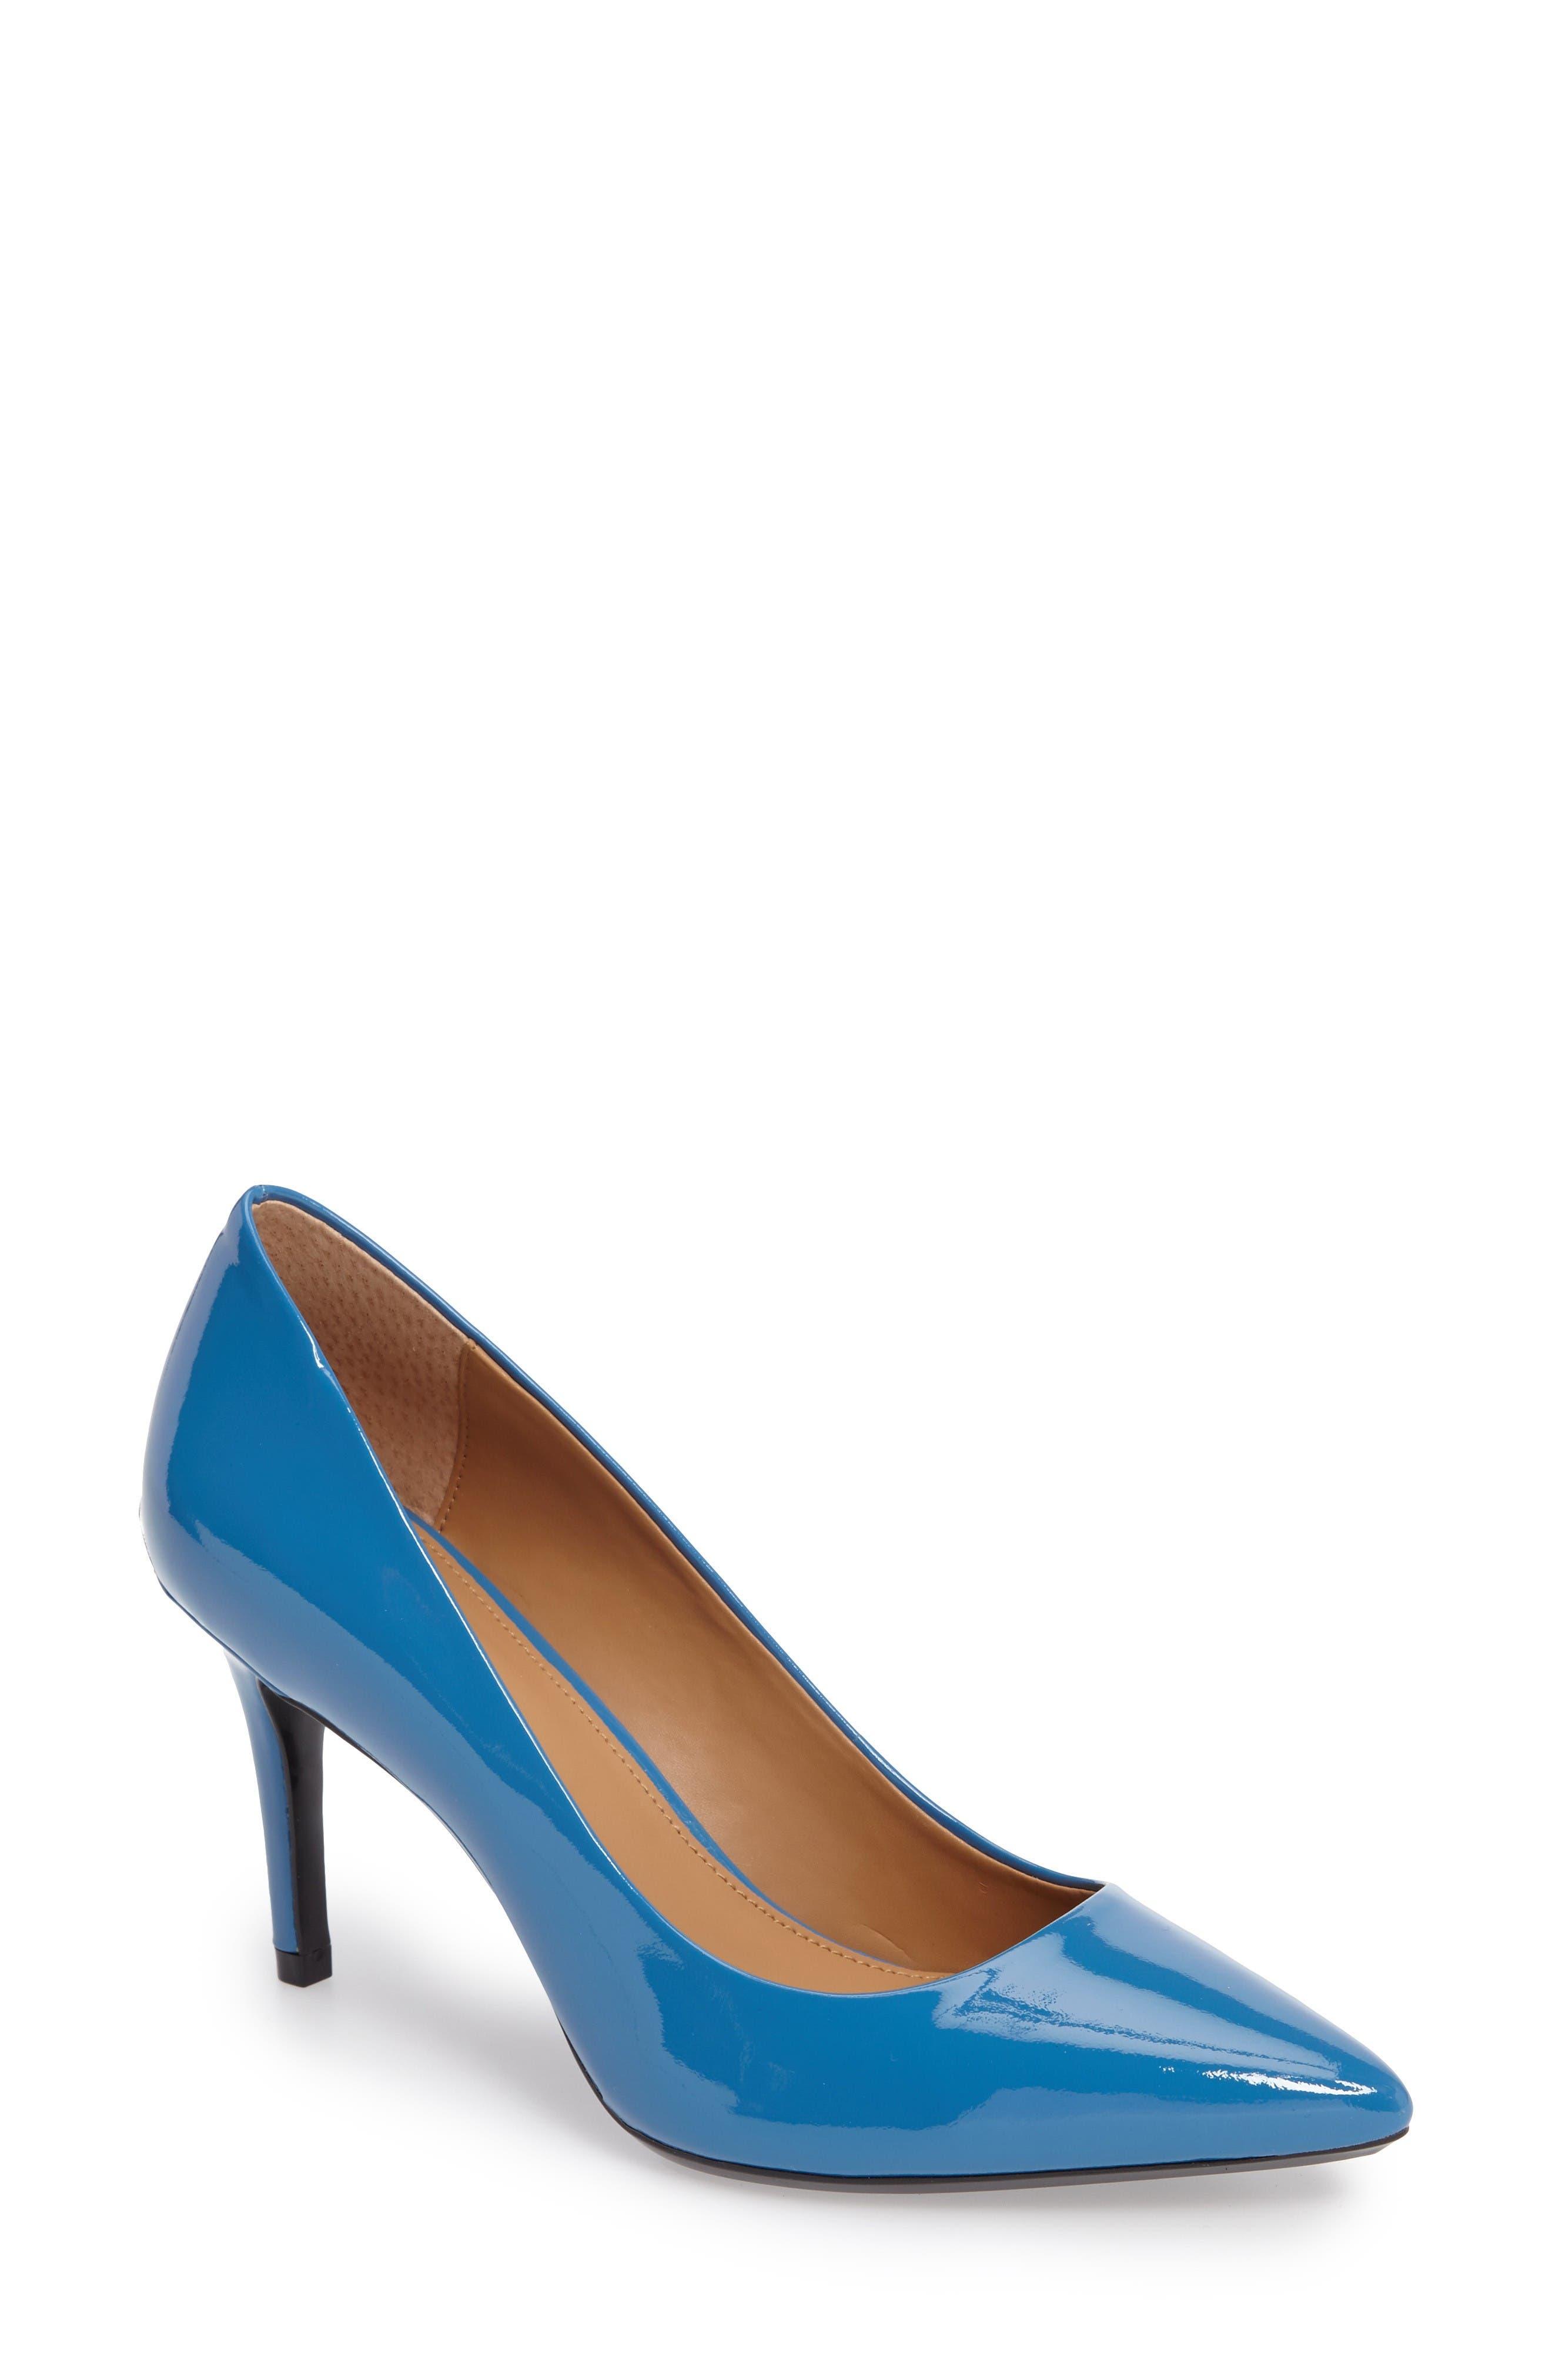 Main Image - Calvin Klein 'Gayle' Pointy Toe Pump (Women)